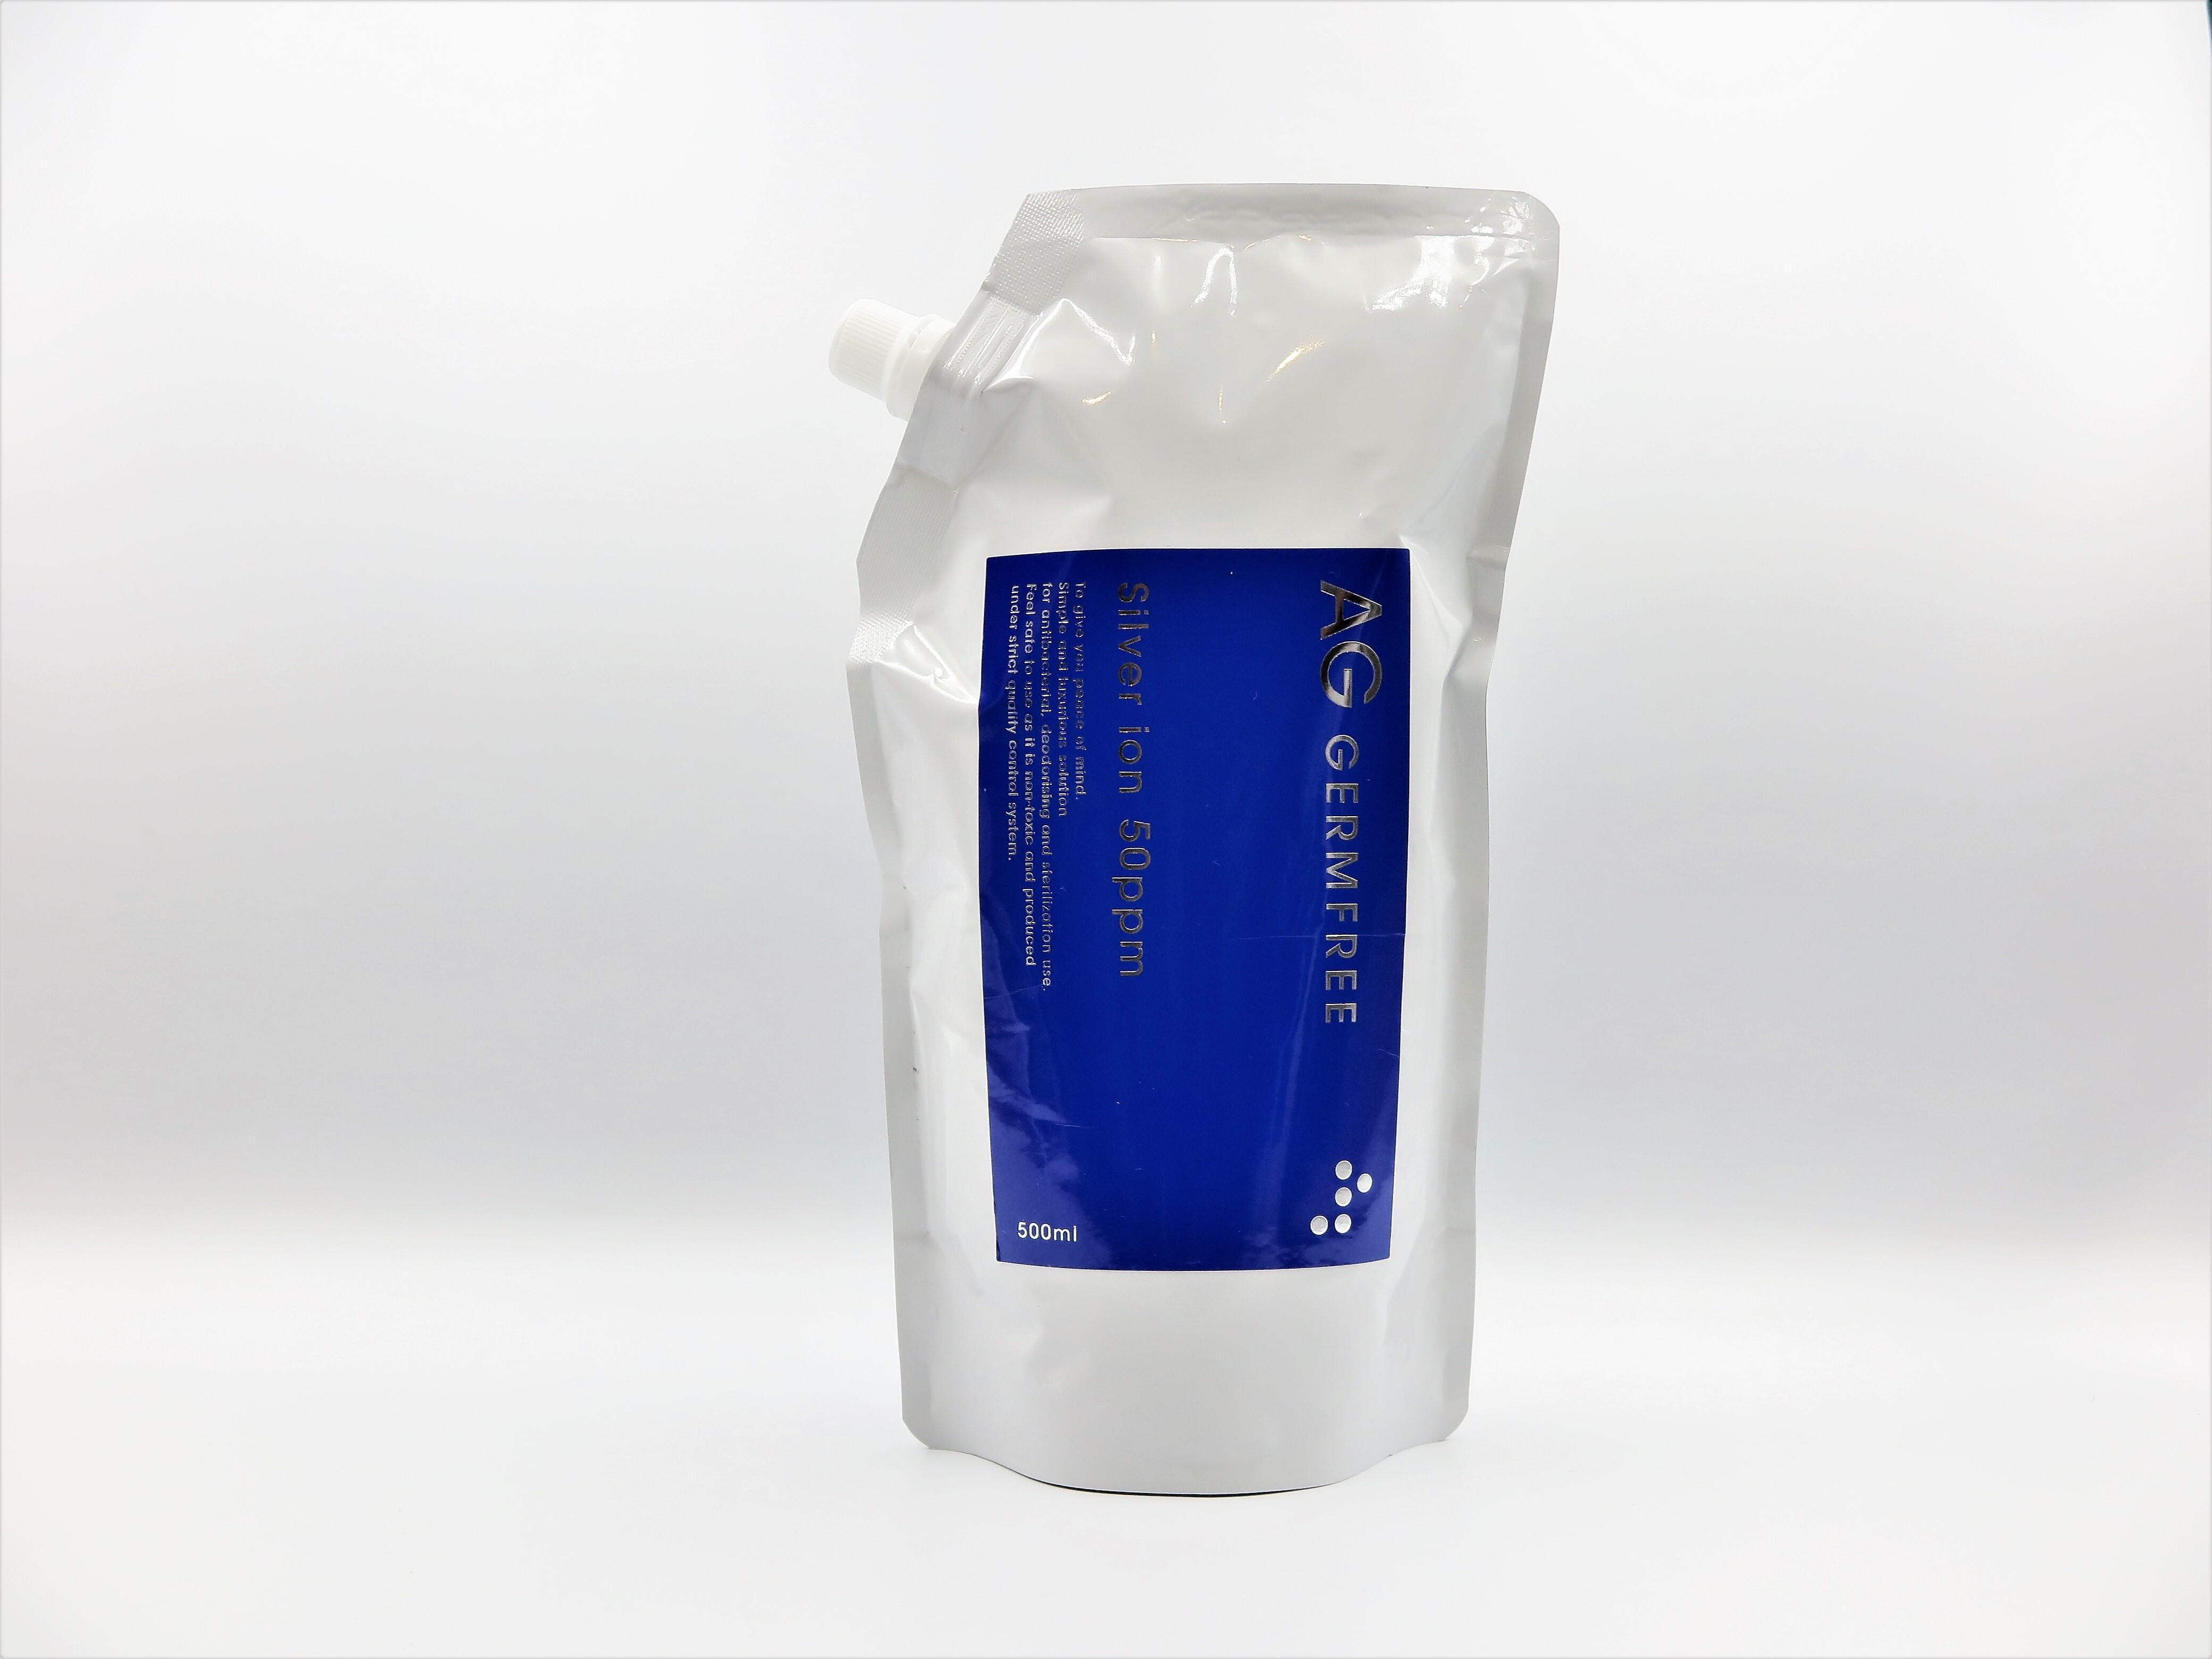 AG GERMFREE 500ml|高濃度銀イオン水(50ppm)除菌・抗菌・消臭に